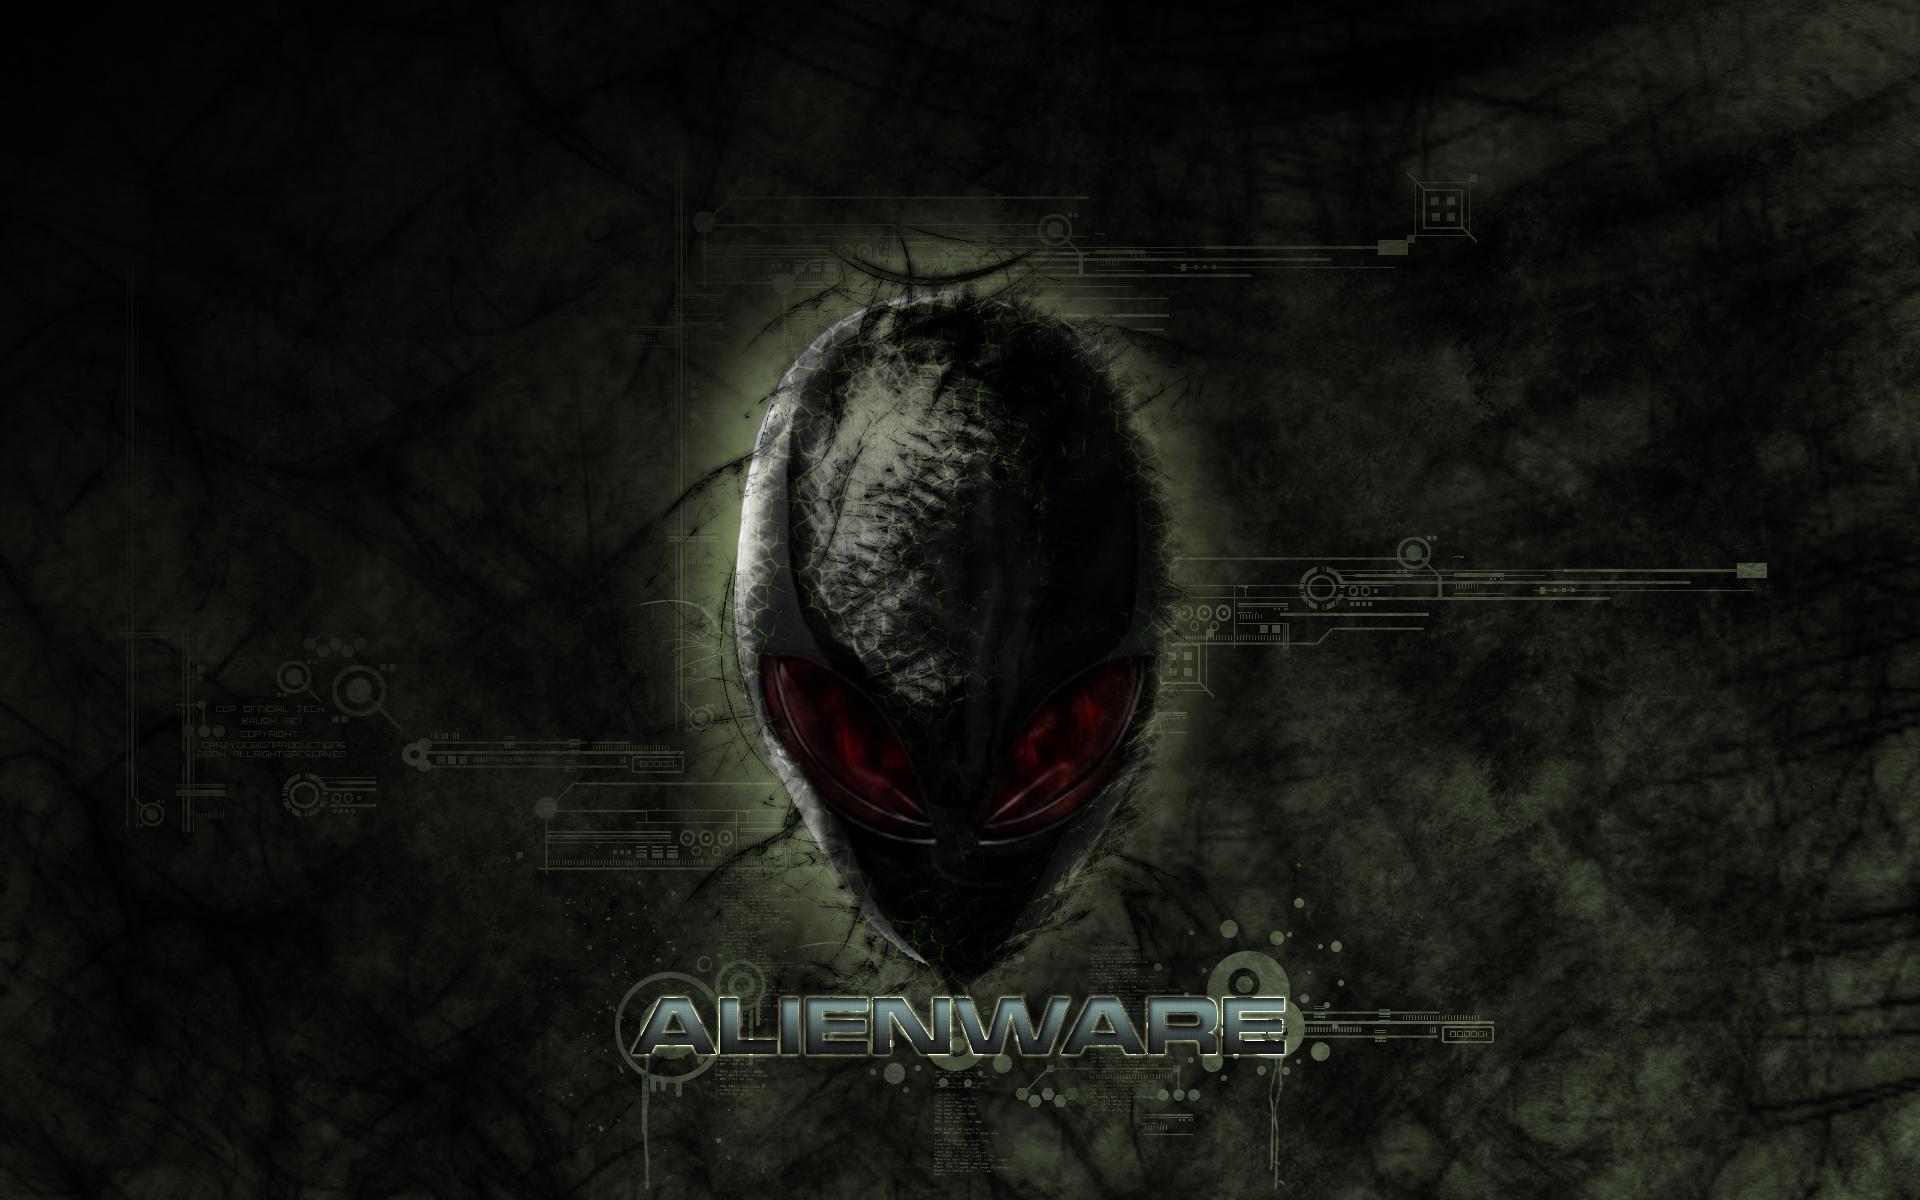 Alienware wallpaper favourites by junni45 on deviantart alienware wallpaper voltagebd Gallery